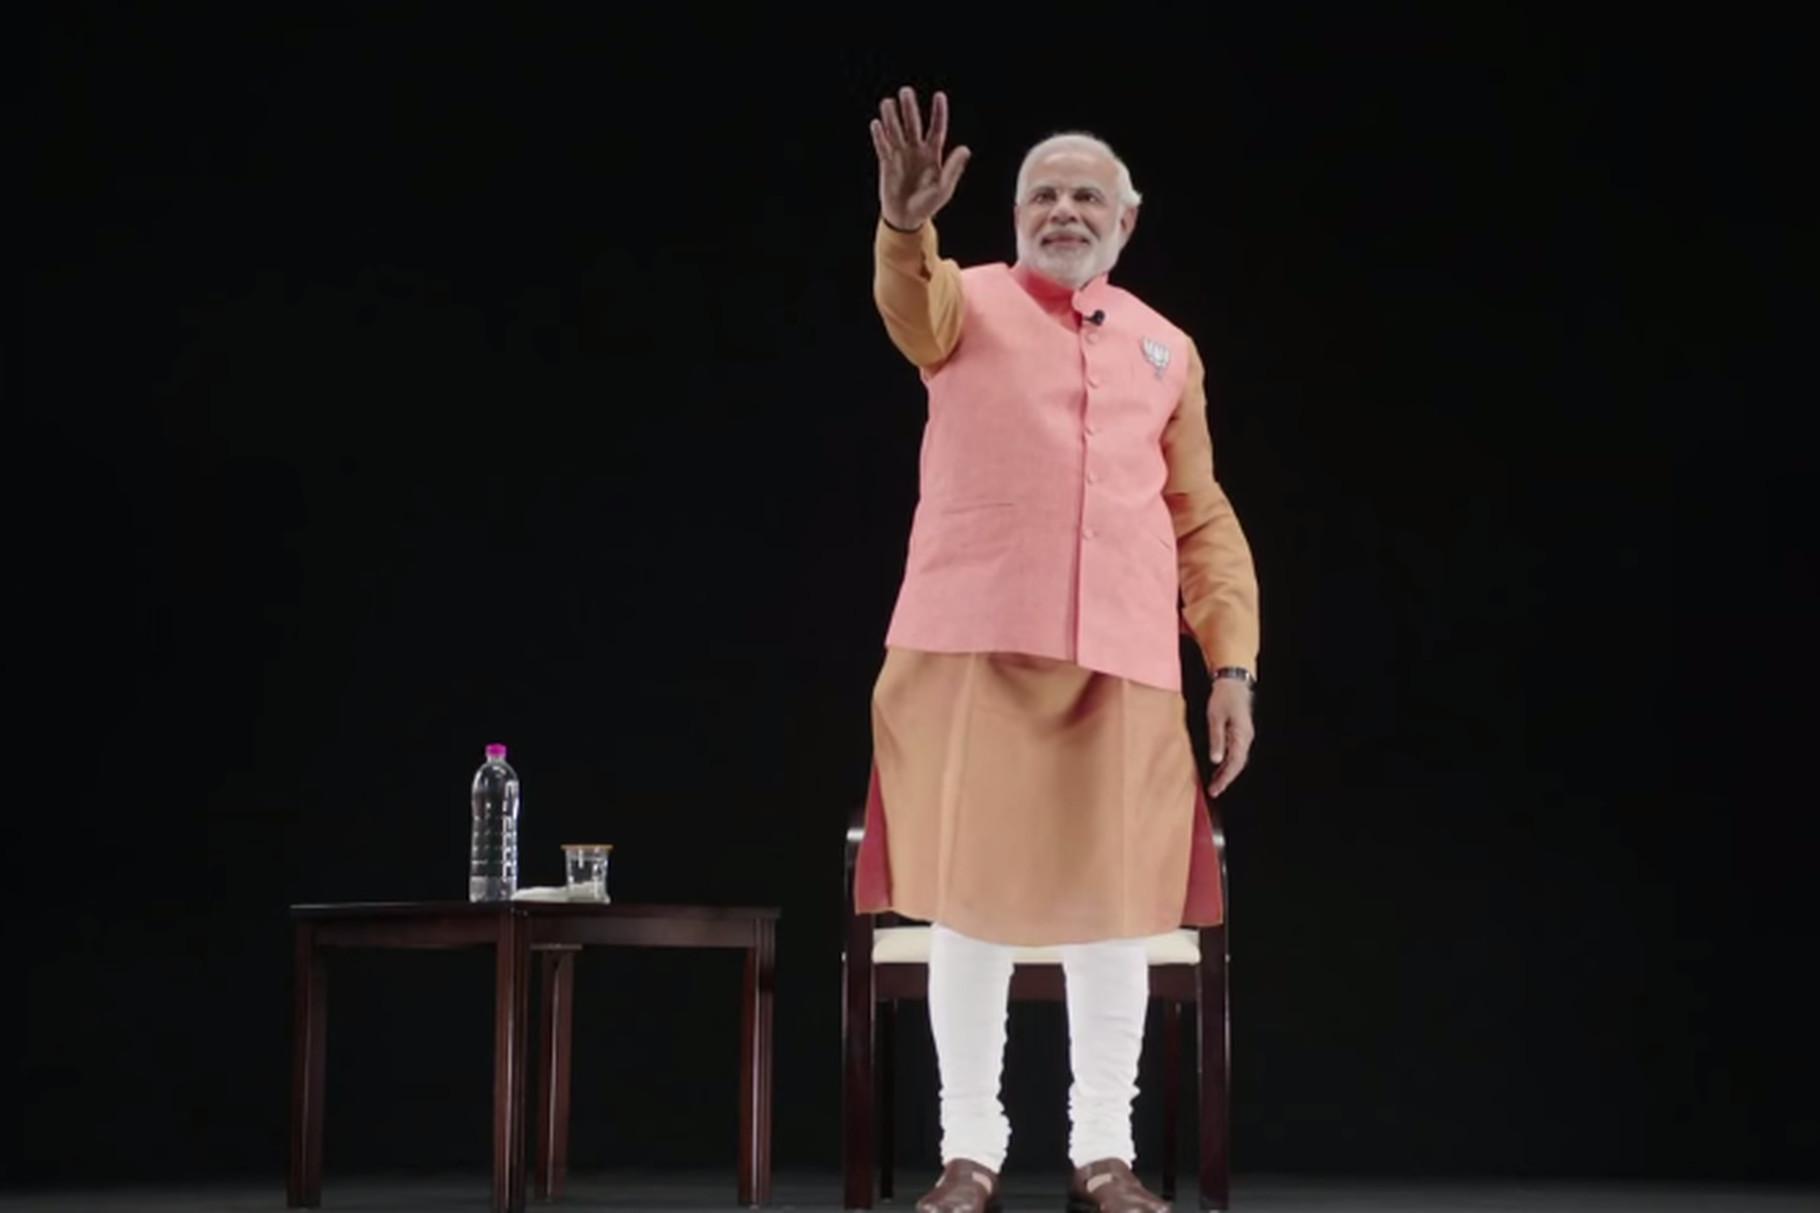 The Modi Hologram